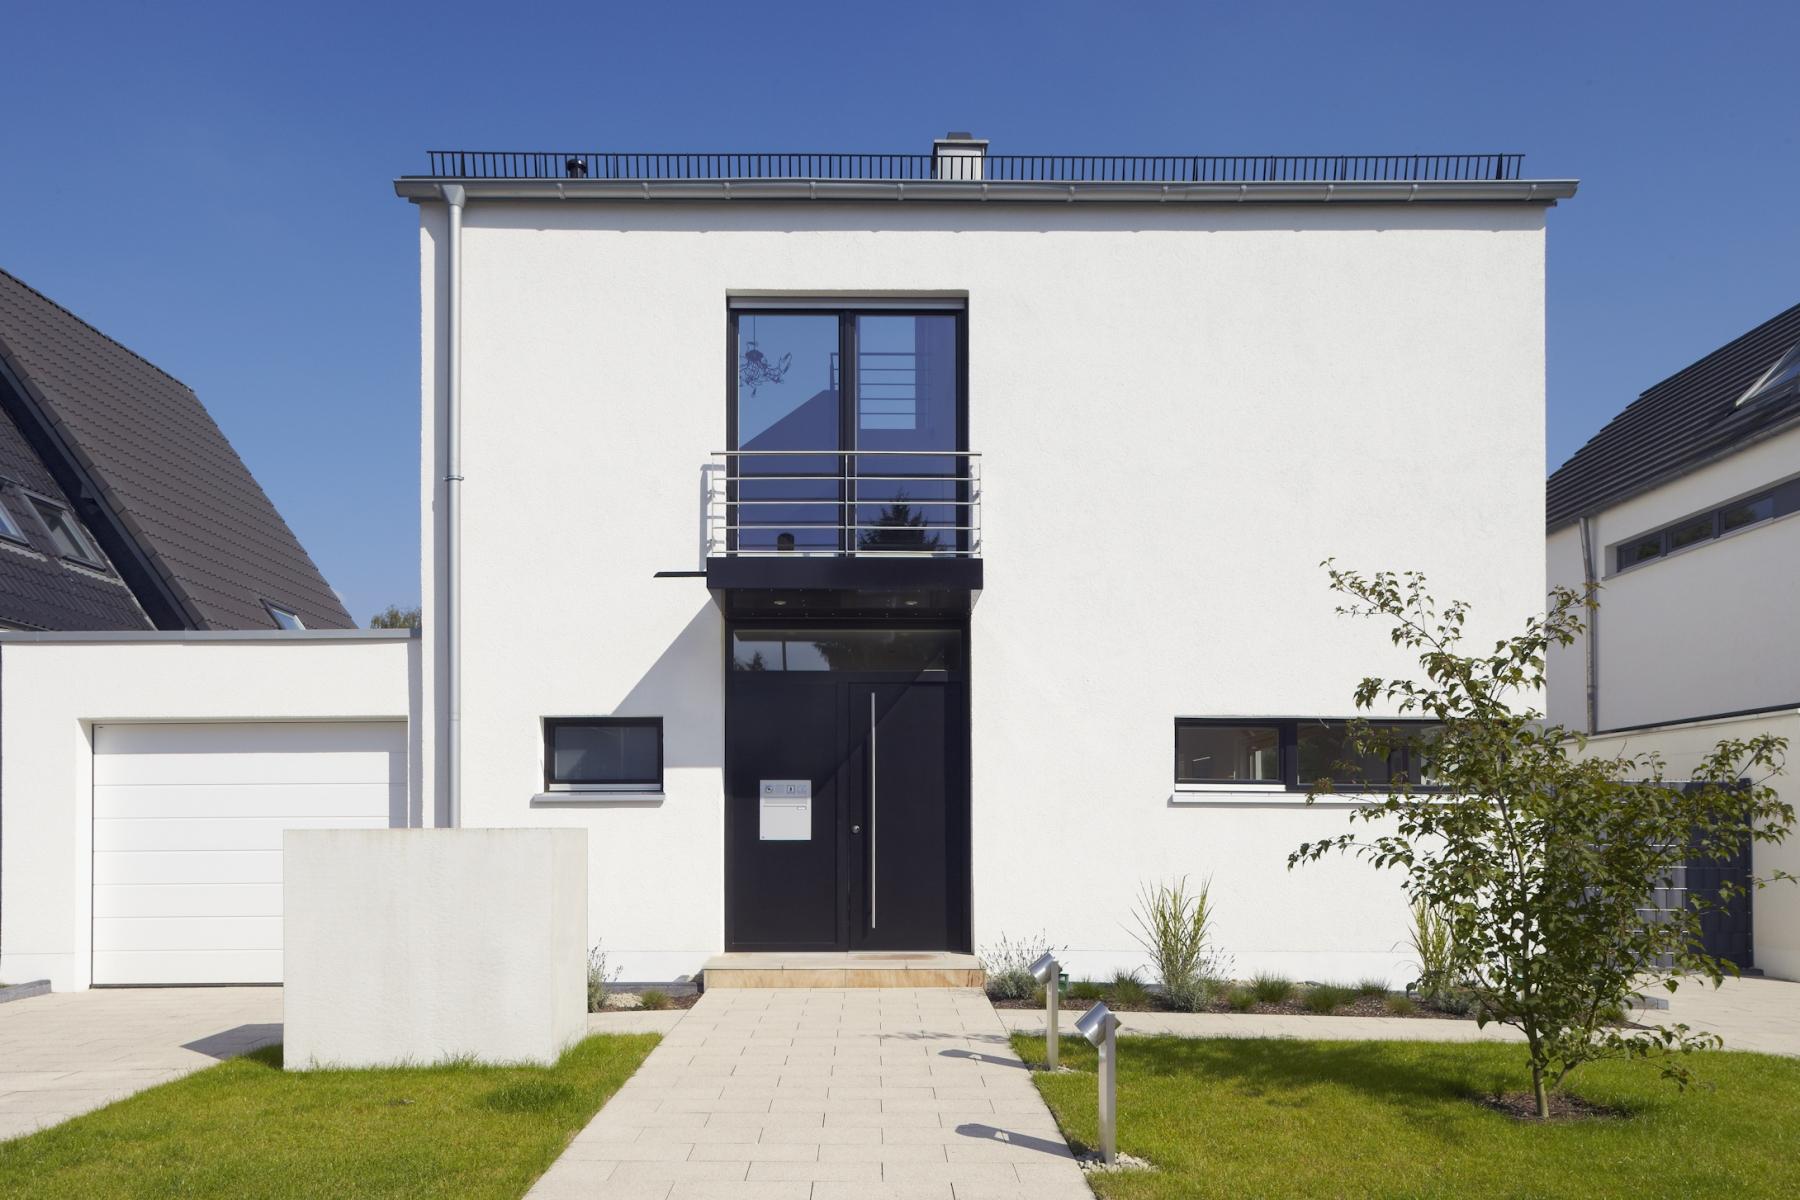 Stadthaus Köln, Architekt C.E. Palm